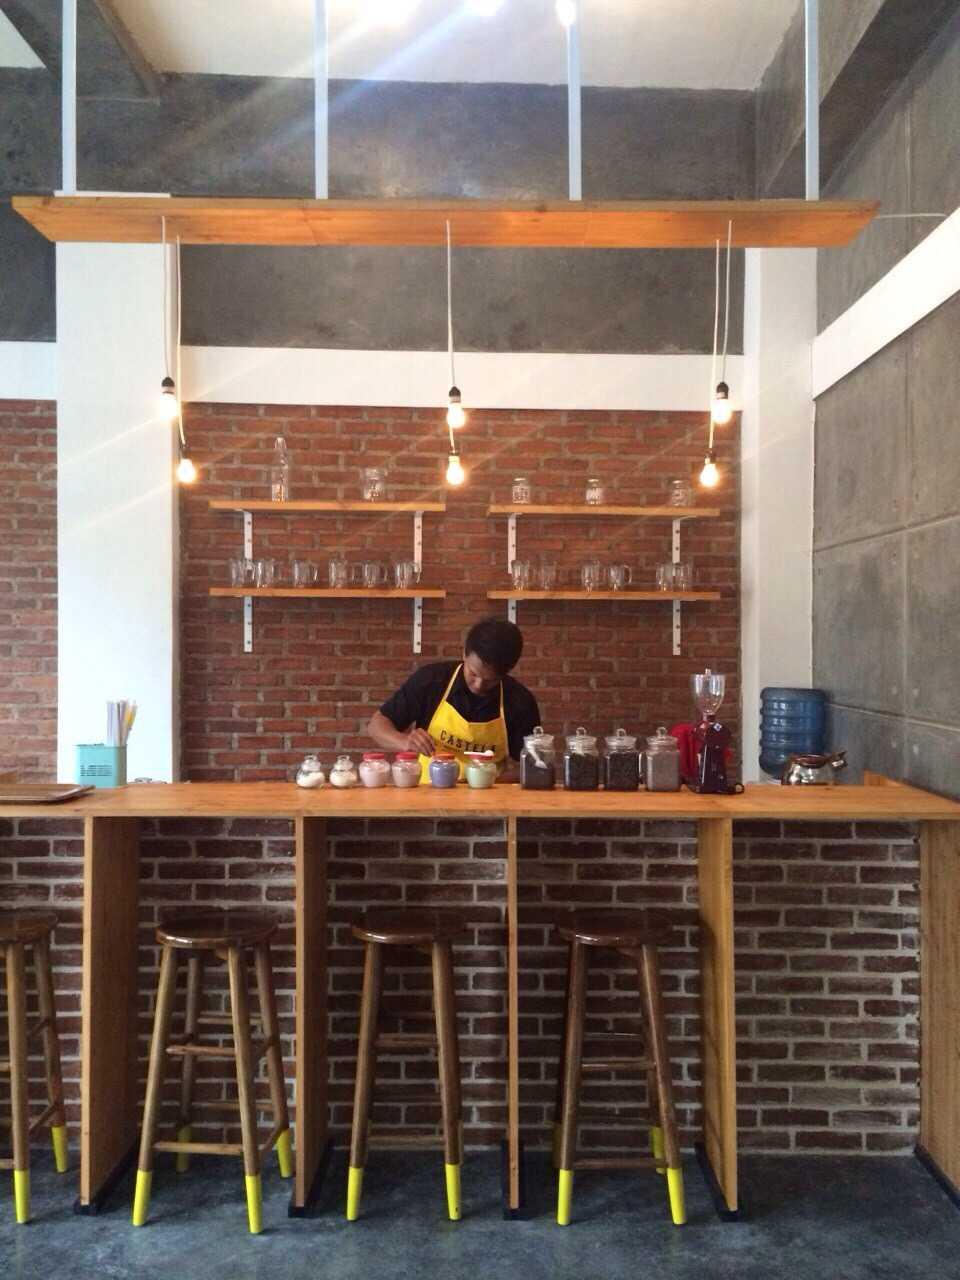 Sia Living Castella Eatery Depok, Kota Depok, Jawa Barat, Indonesia  Bar Area   46639